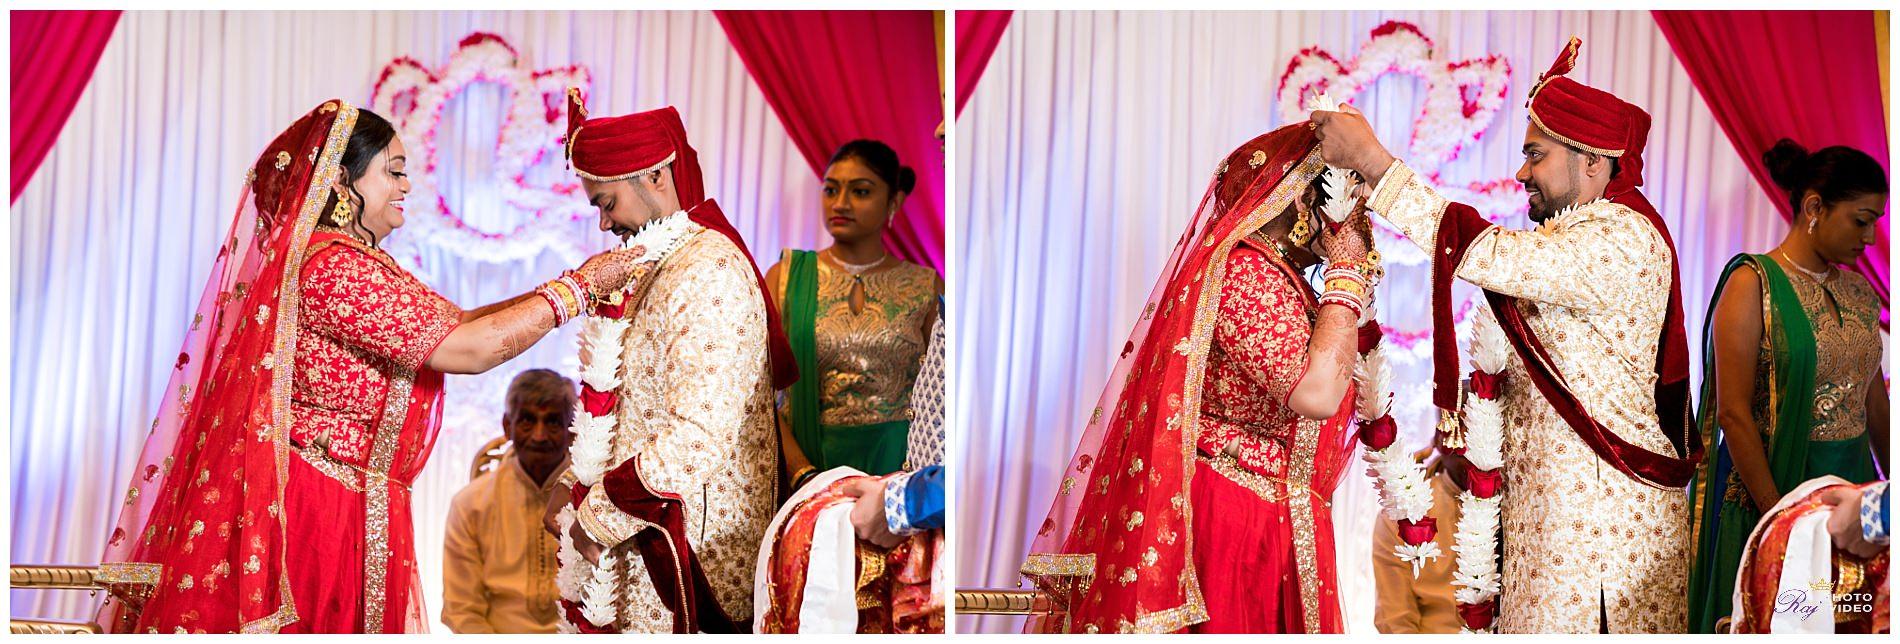 doubletree-by-hilton-hotel-wilmington-de-wedding-krishna-ritesh-55.jpg